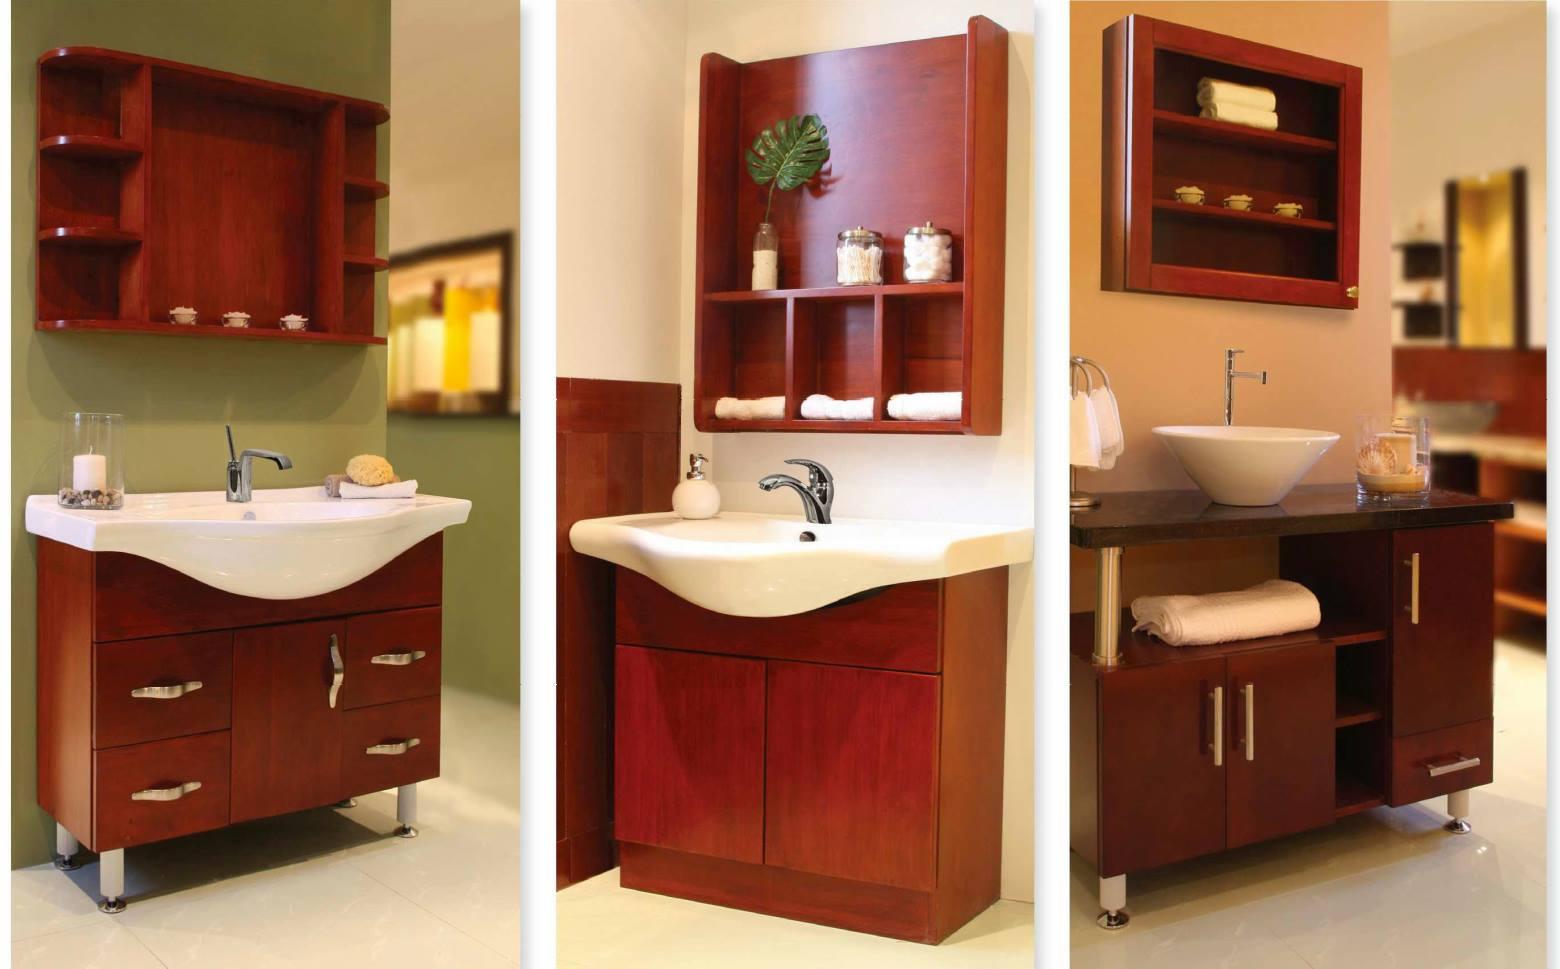 Panda Kitchen   Bath Doral  FL 33122   YP com. Panda Kitchen Bath Locations. Home Design Ideas